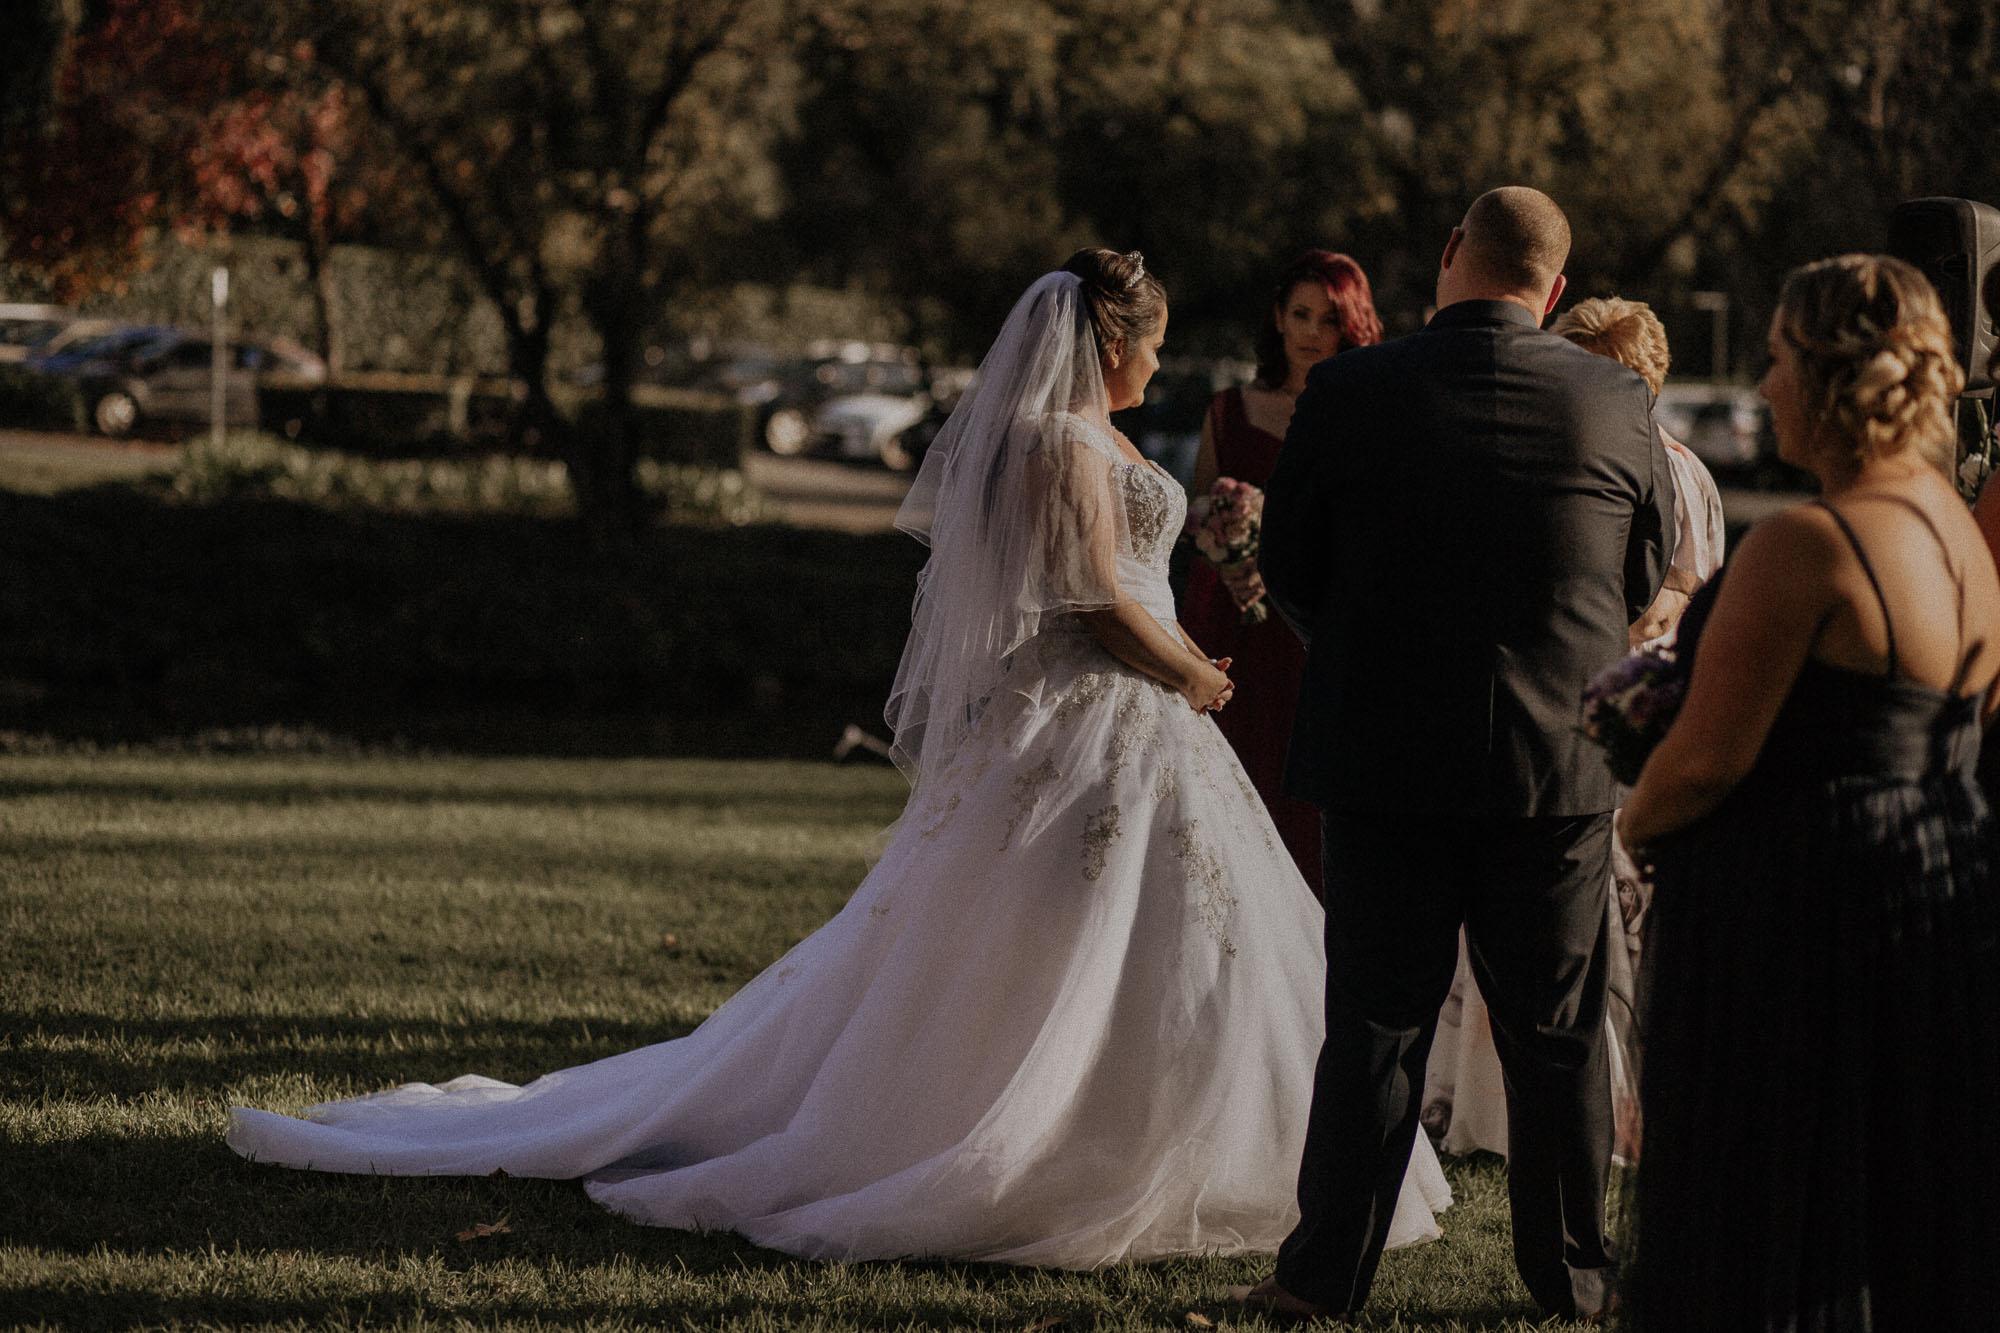 bride-wedding-dress.jpg